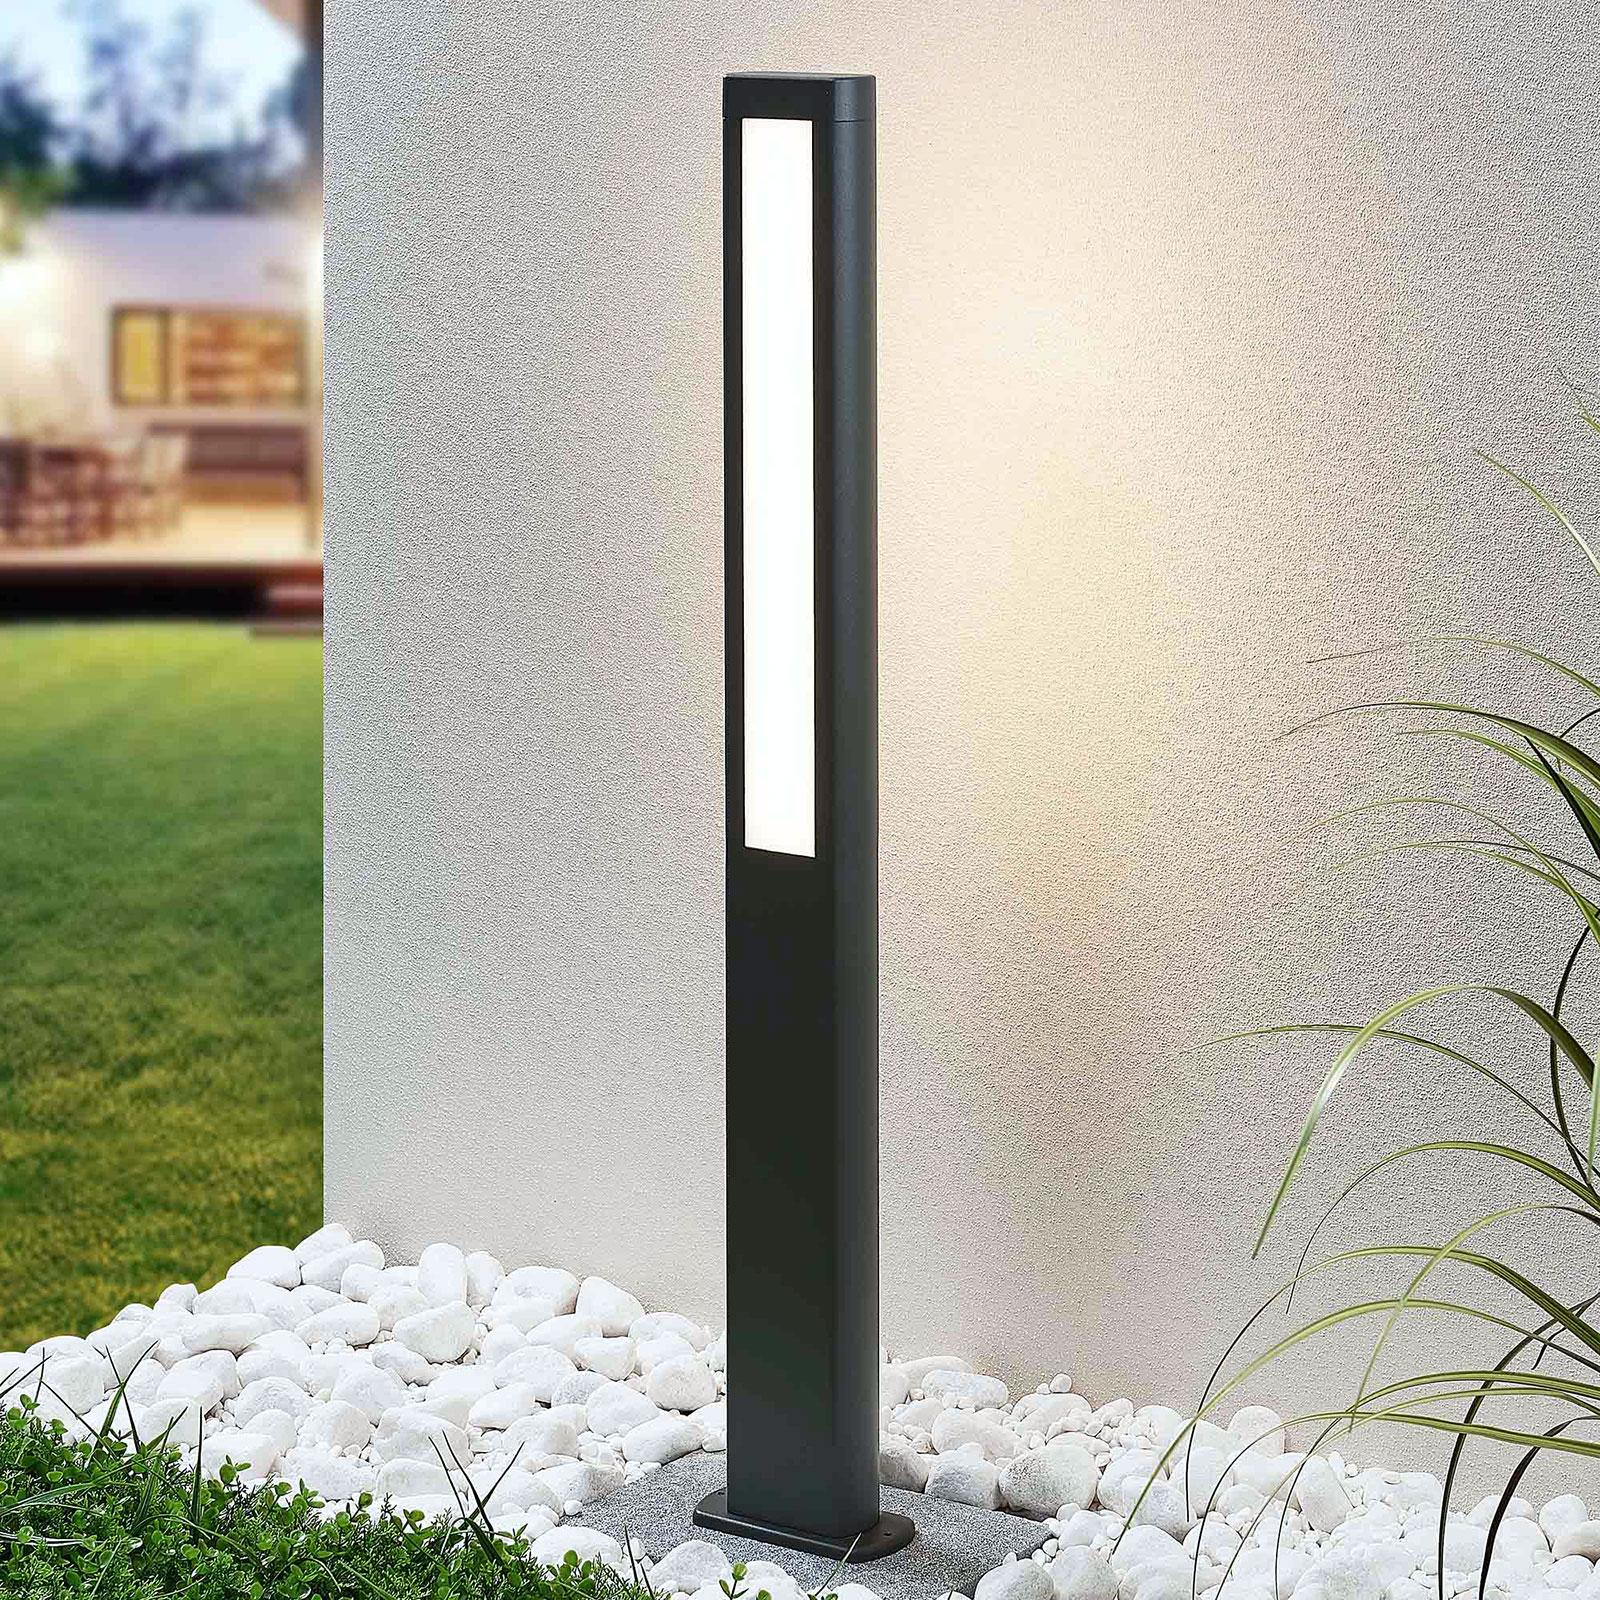 Słupek ogrodowy LED Mhairi,kanciasty,szary,100cm